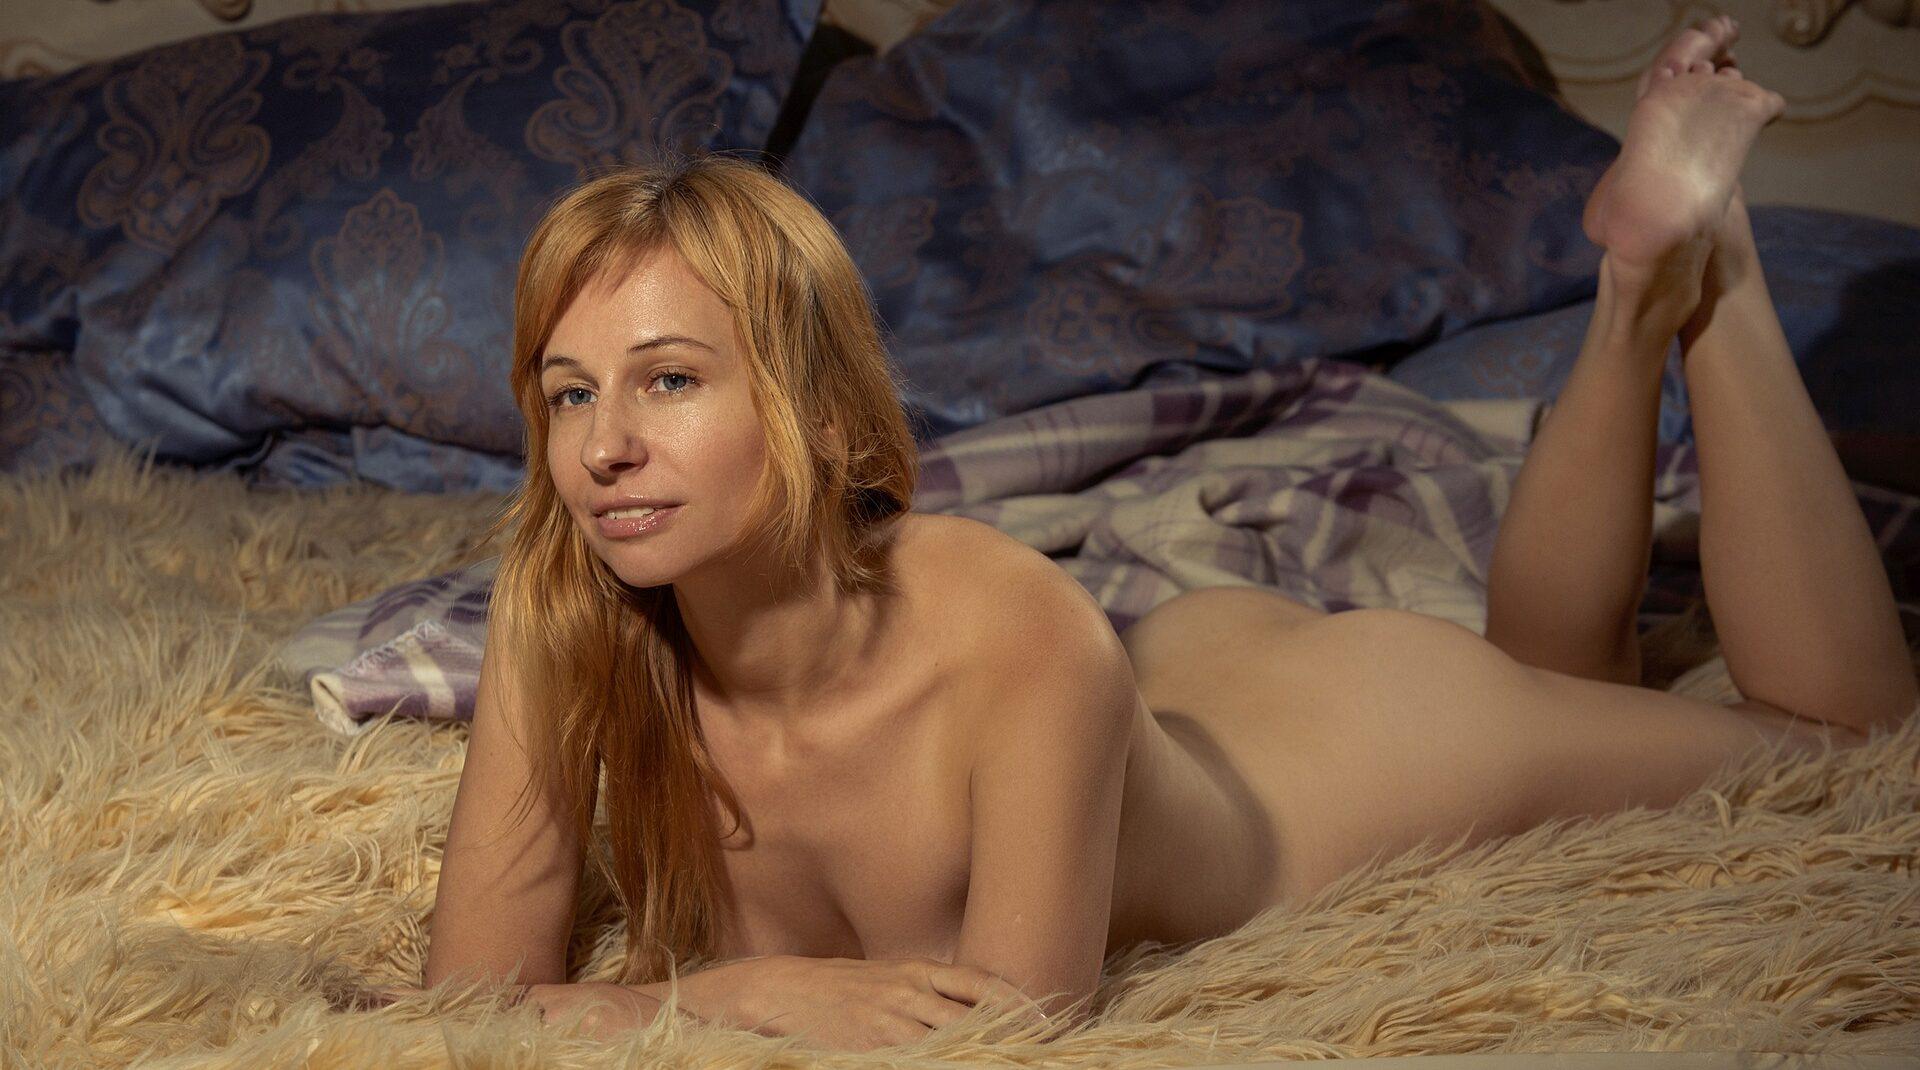 Private Sexadressen